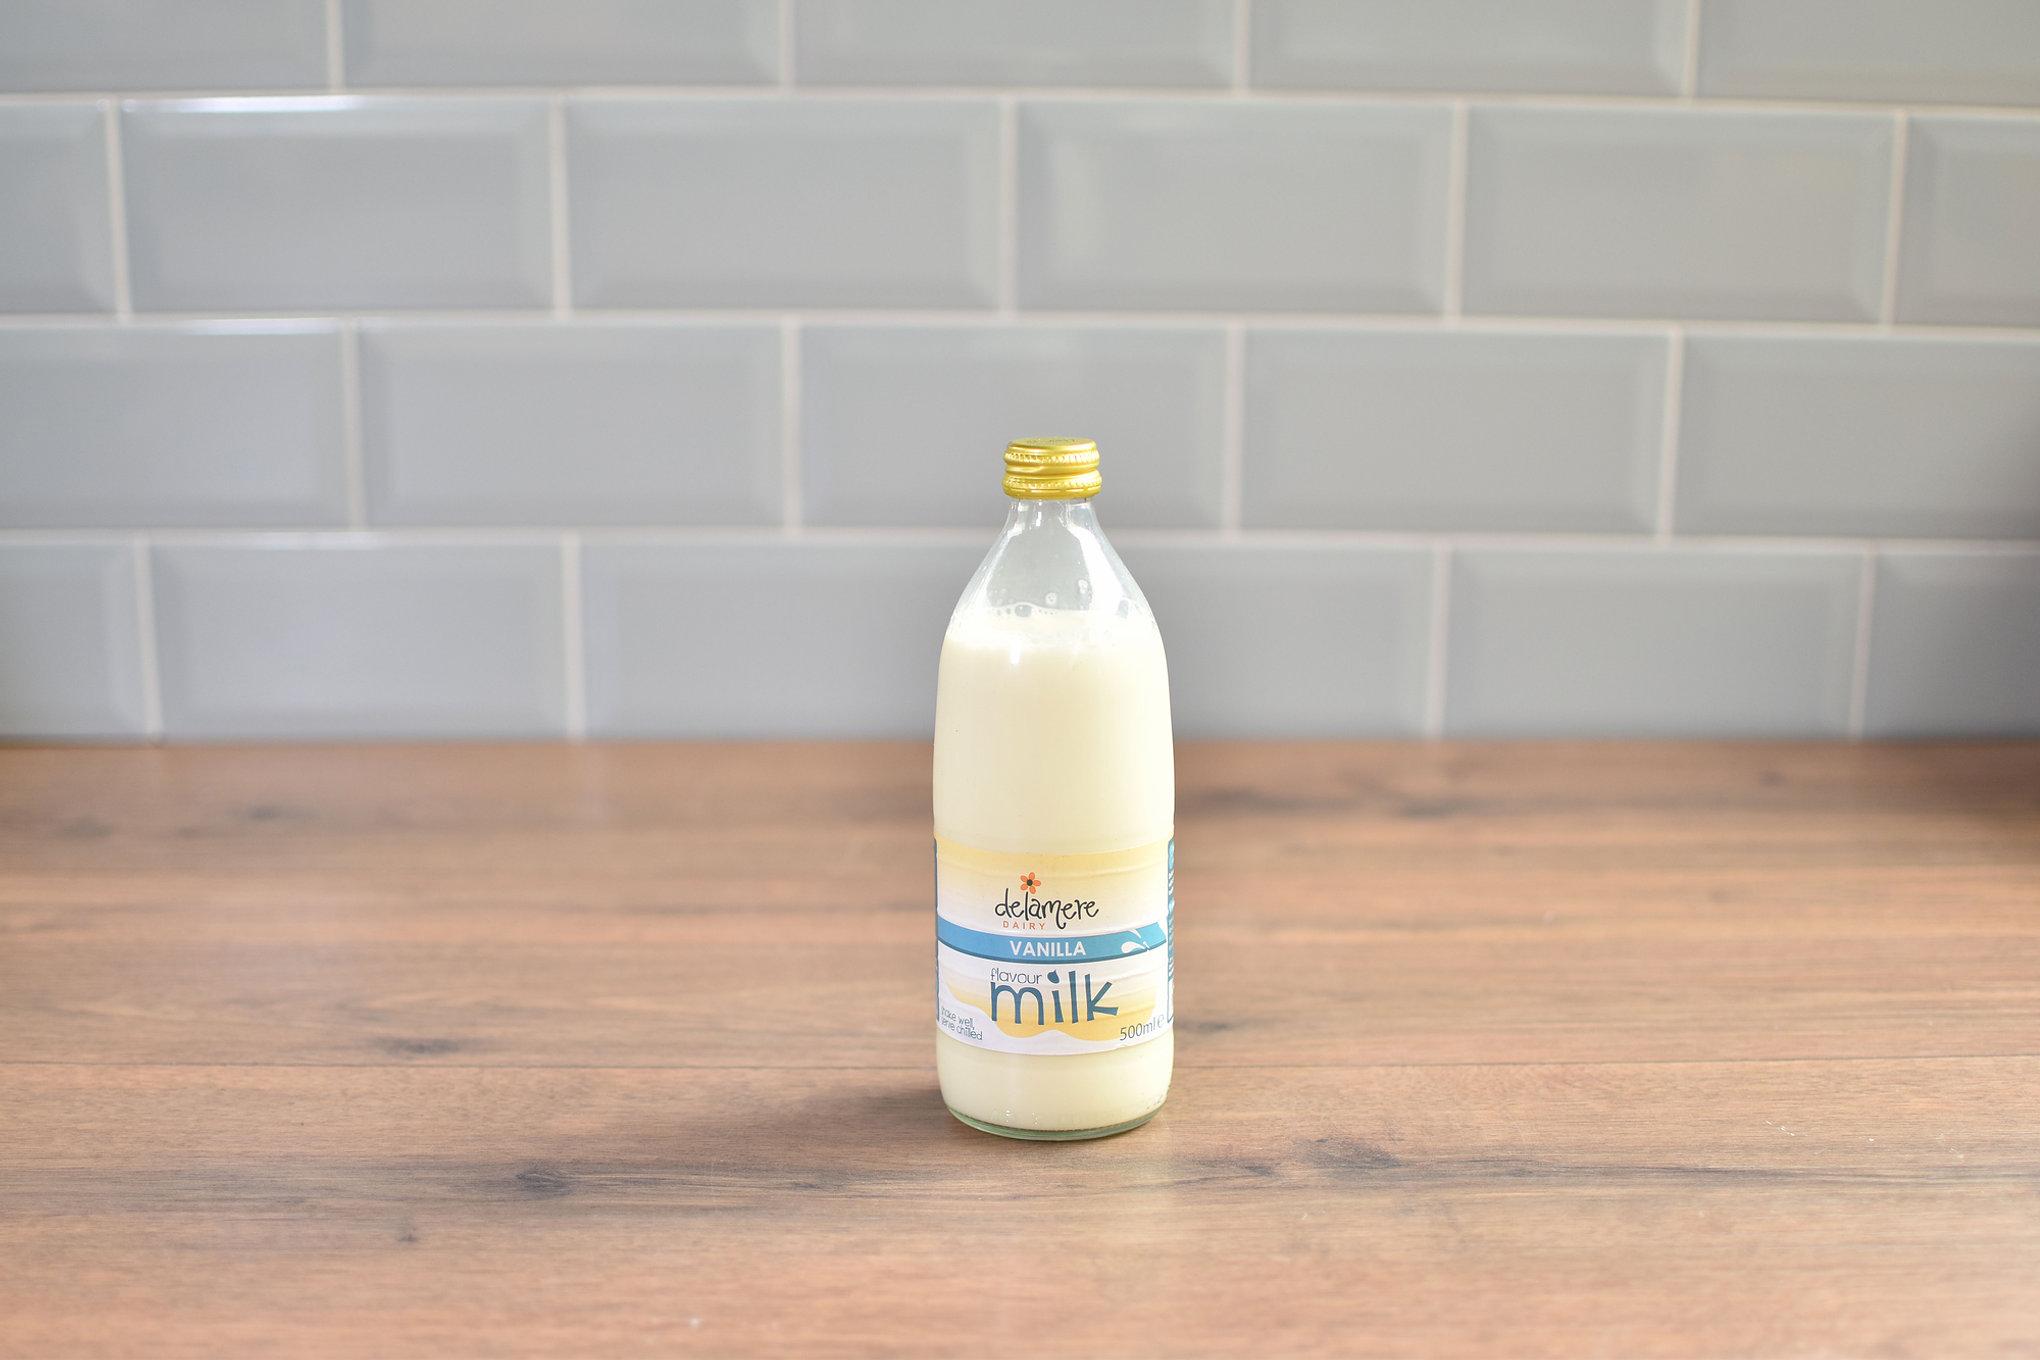 Delamere Vanilla Milk - 500ml Glass Bottle